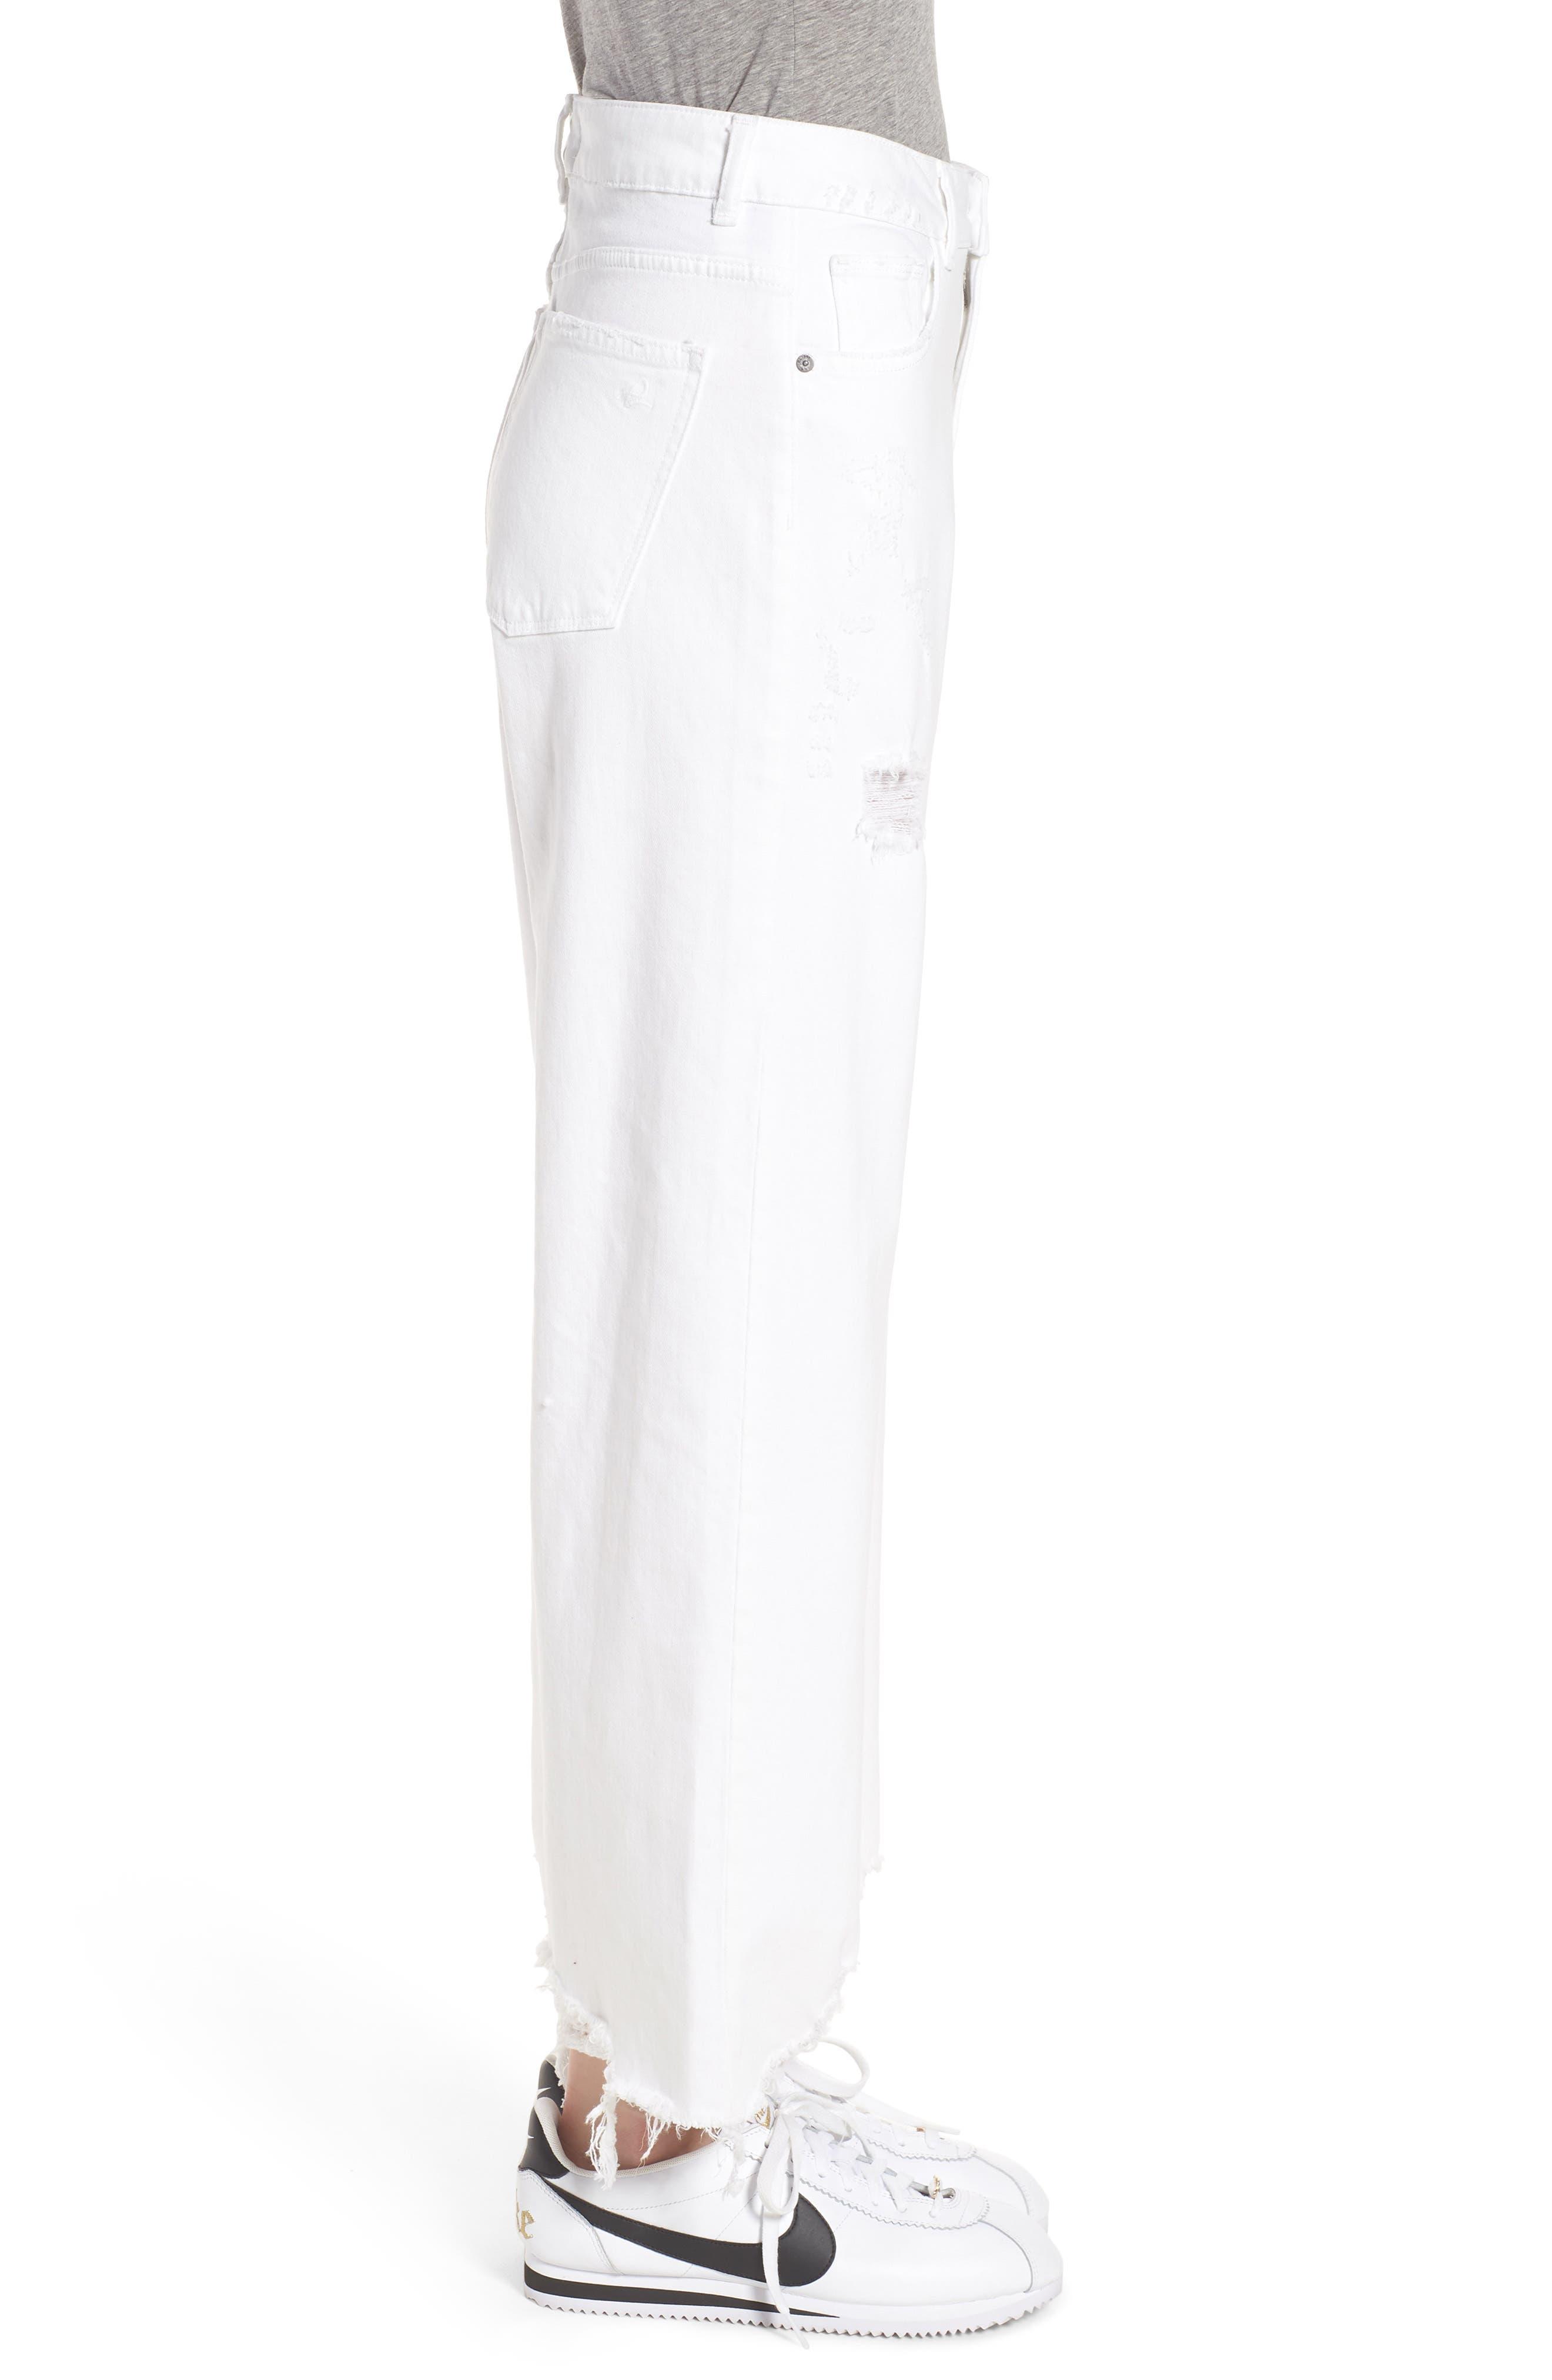 Hepburn High Waist Wide Leg Jeans,                             Alternate thumbnail 3, color,                             Sacramento